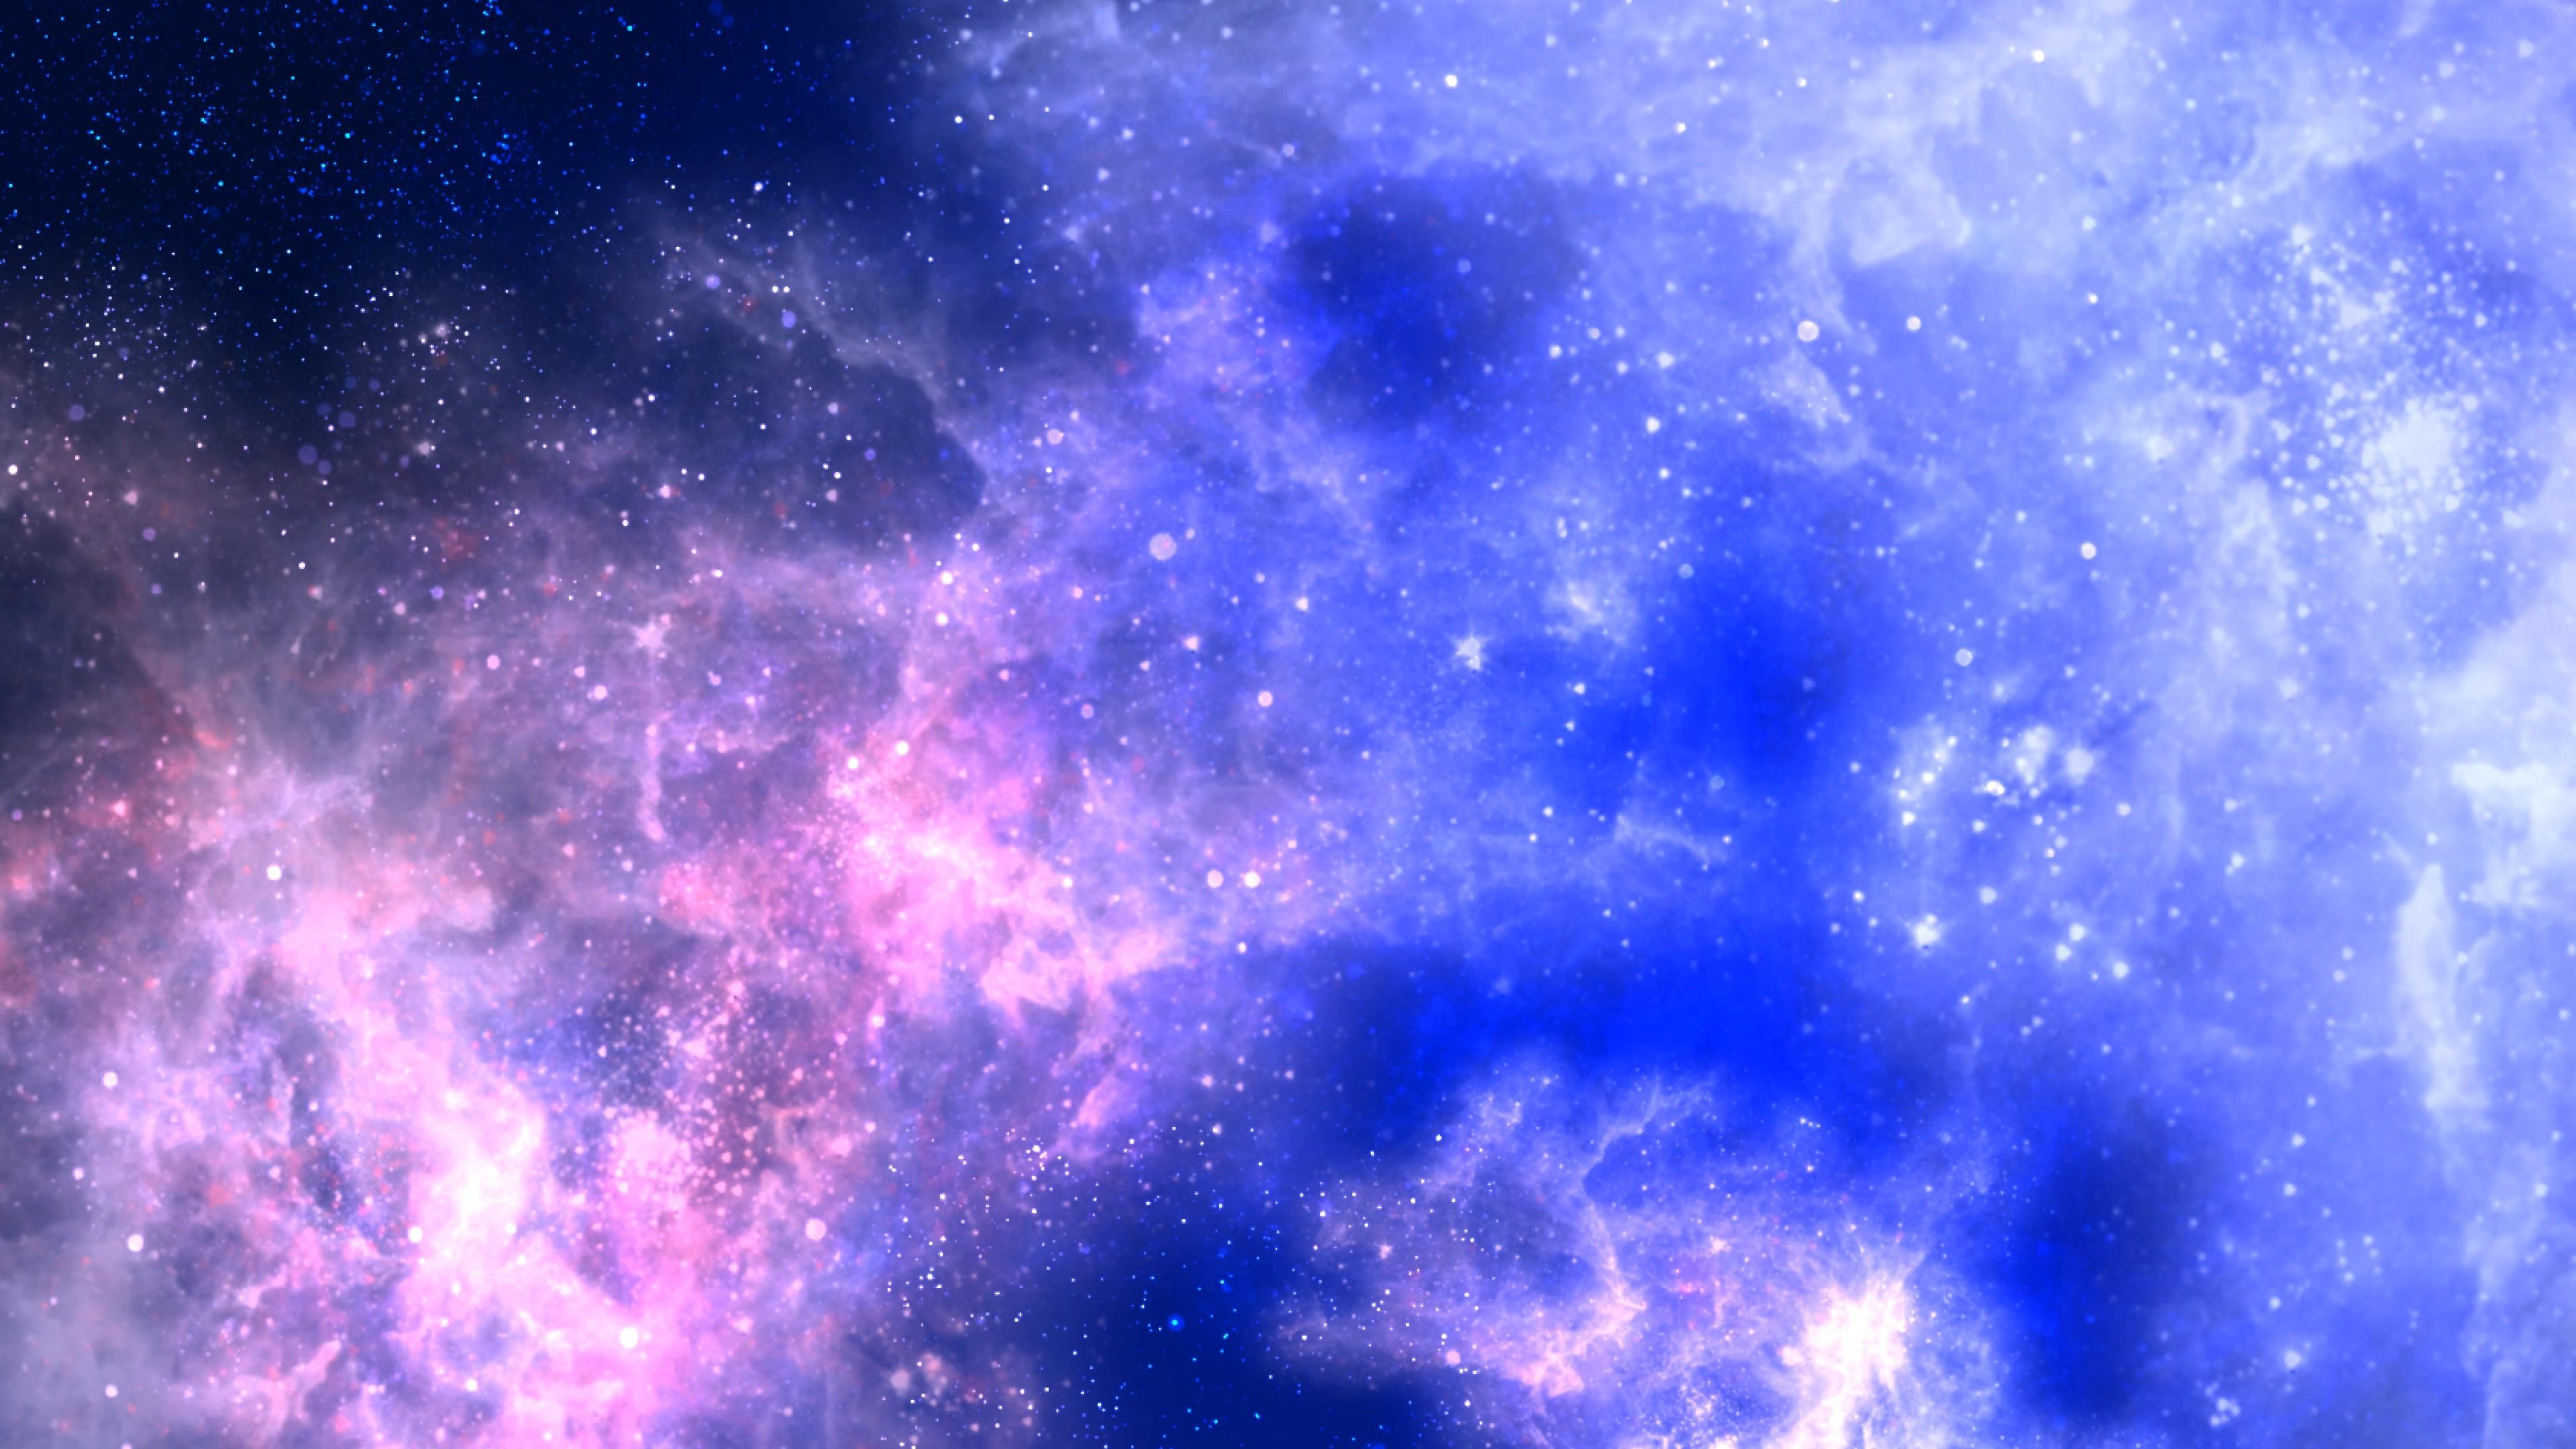 3840x2160 Preview Wallpaper Star Galaxy Glow Light 3840x2160